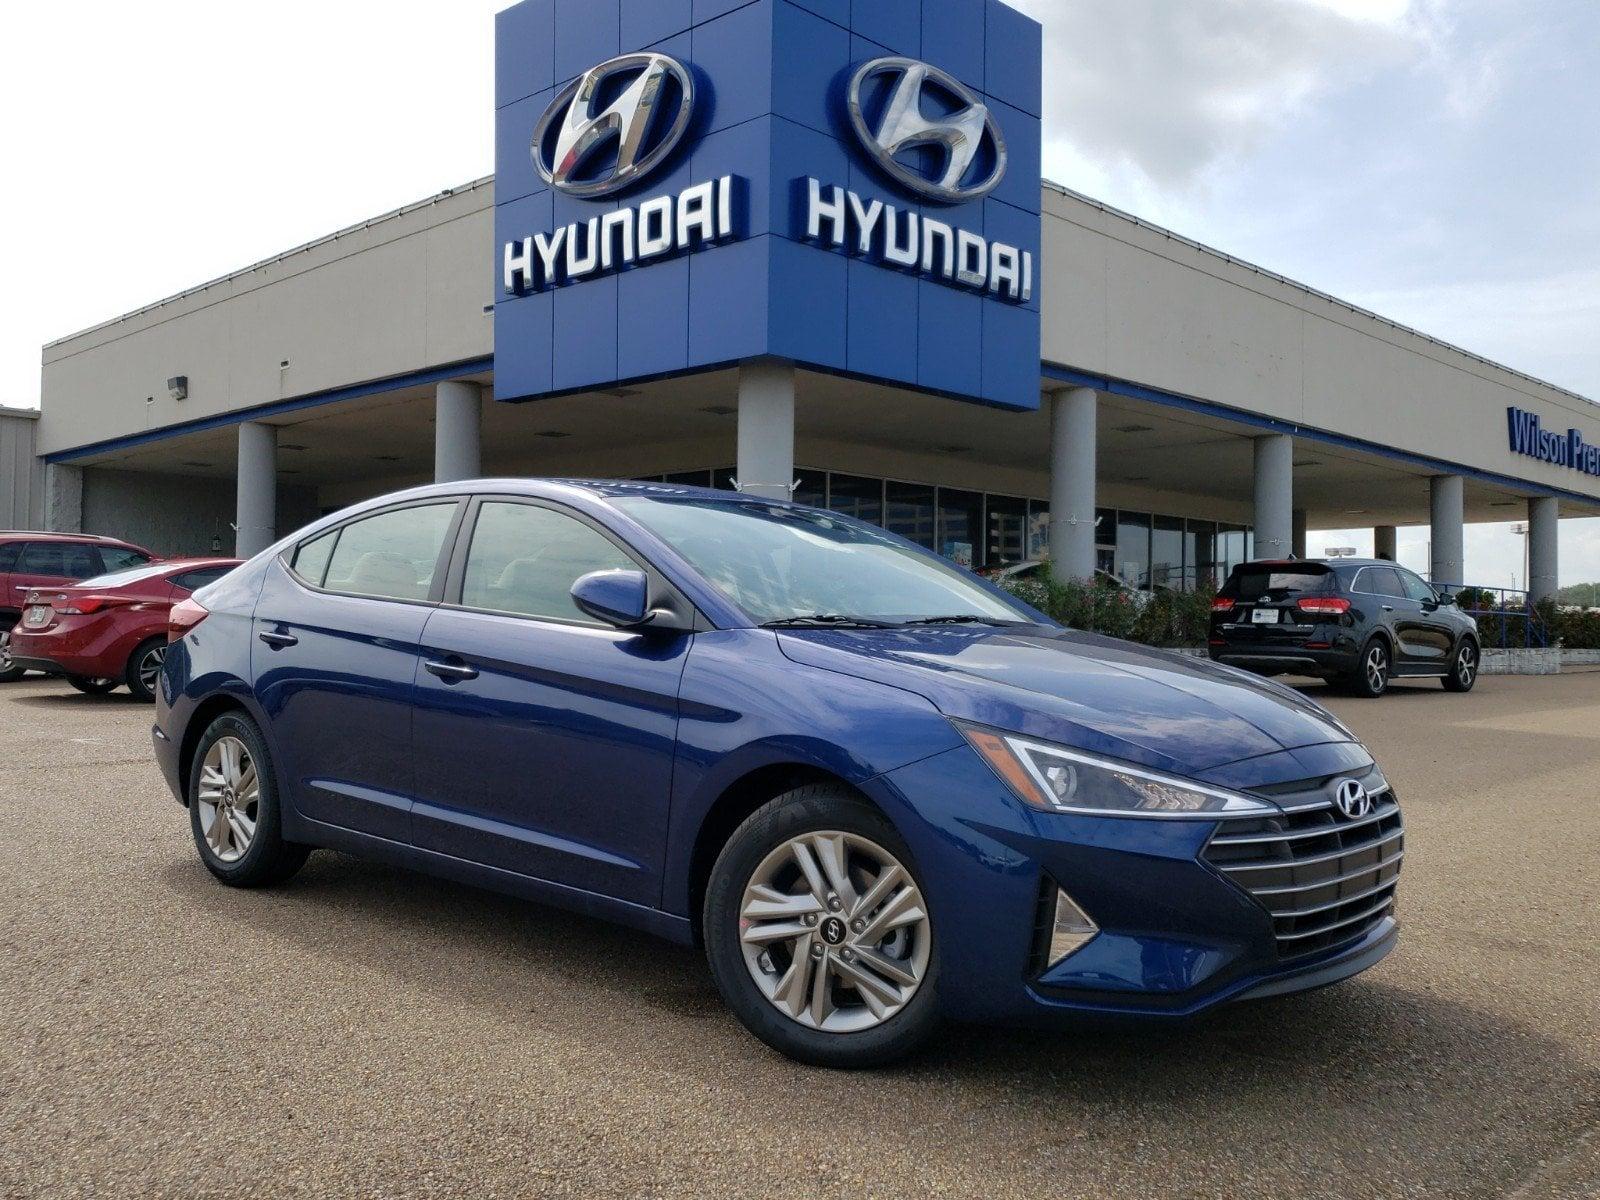 Hyundai elantra 2020 5npd84lfxlh510266 79936 884006729